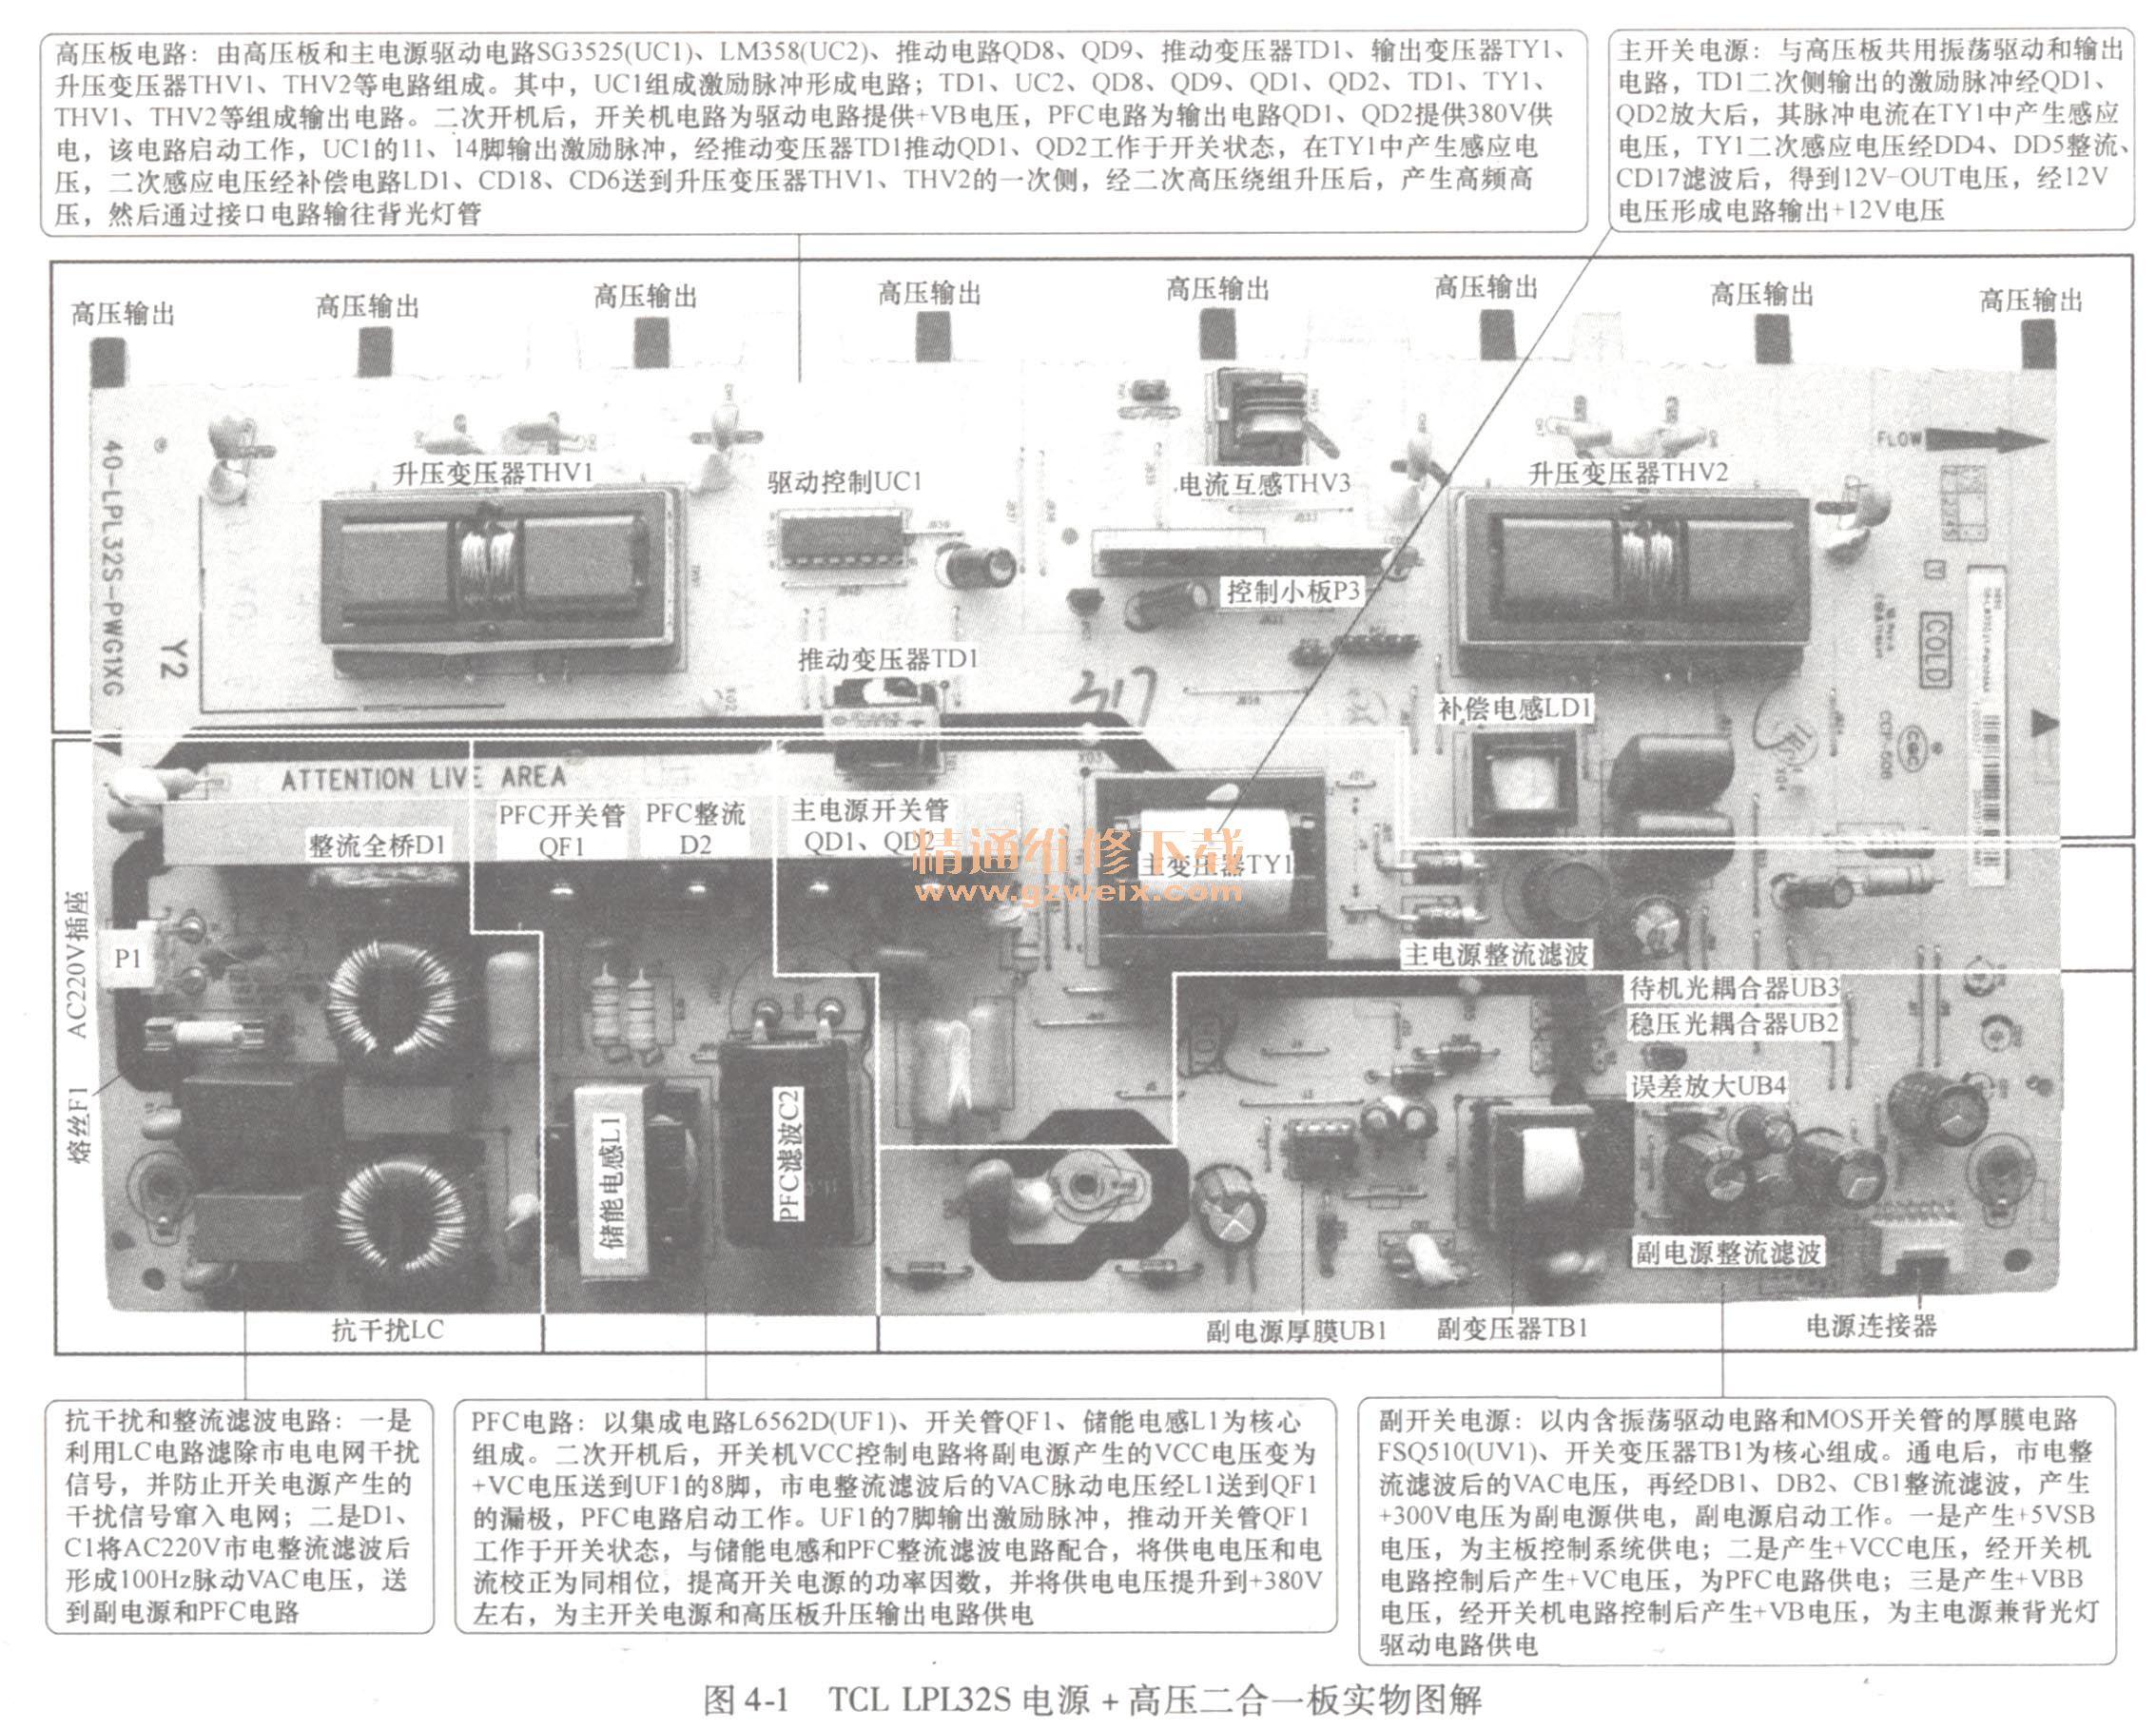 TCL LPL32S电源+高压二合一板实物图解